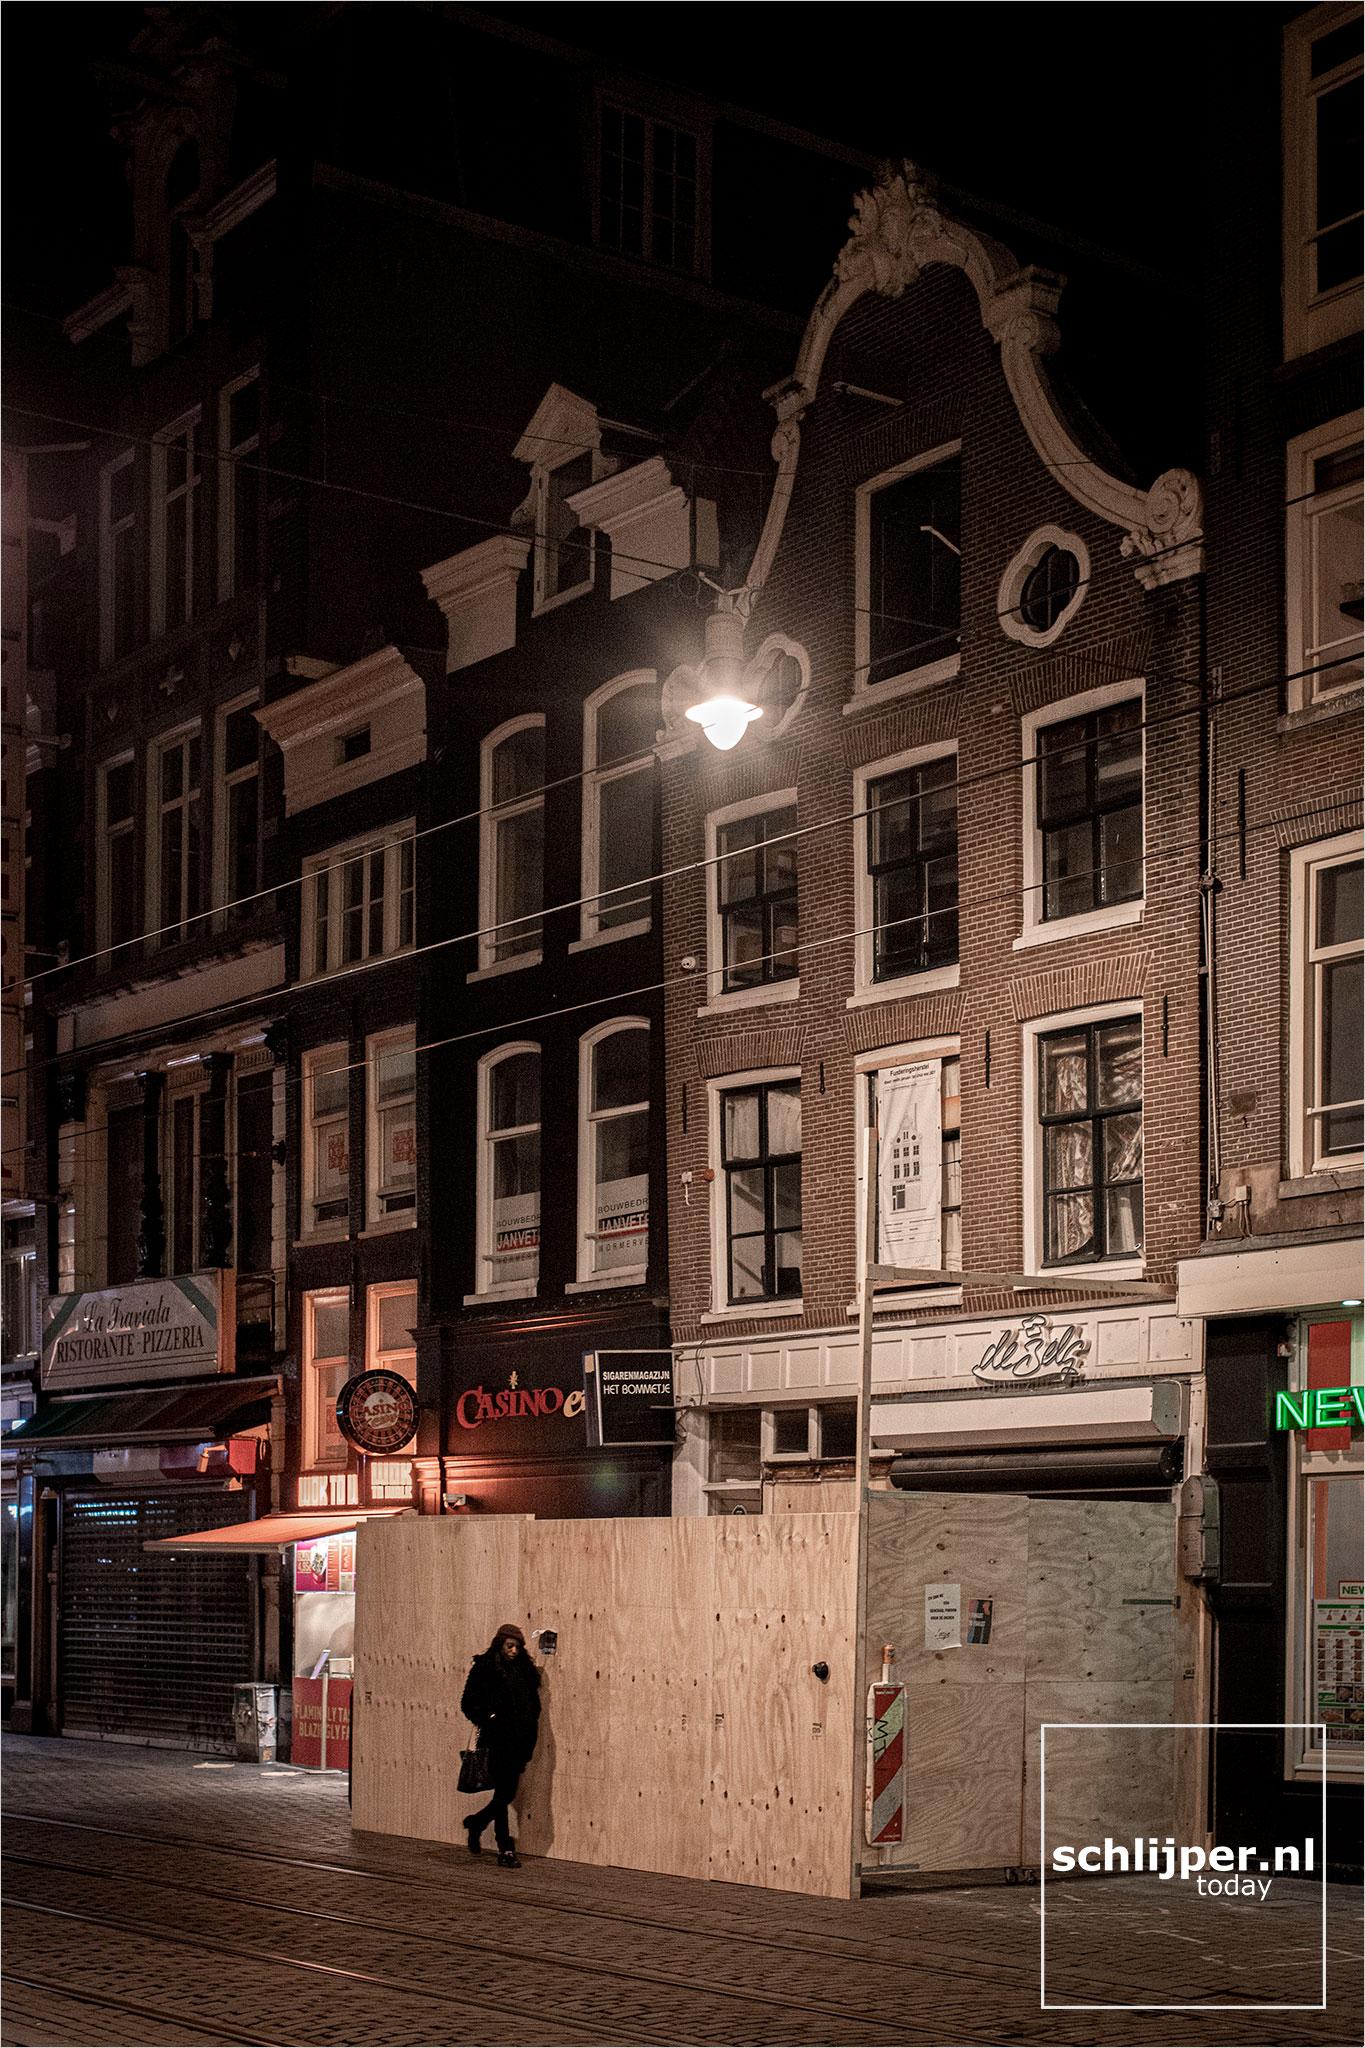 The Netherlands, Amsterdam, 14 januari 2021